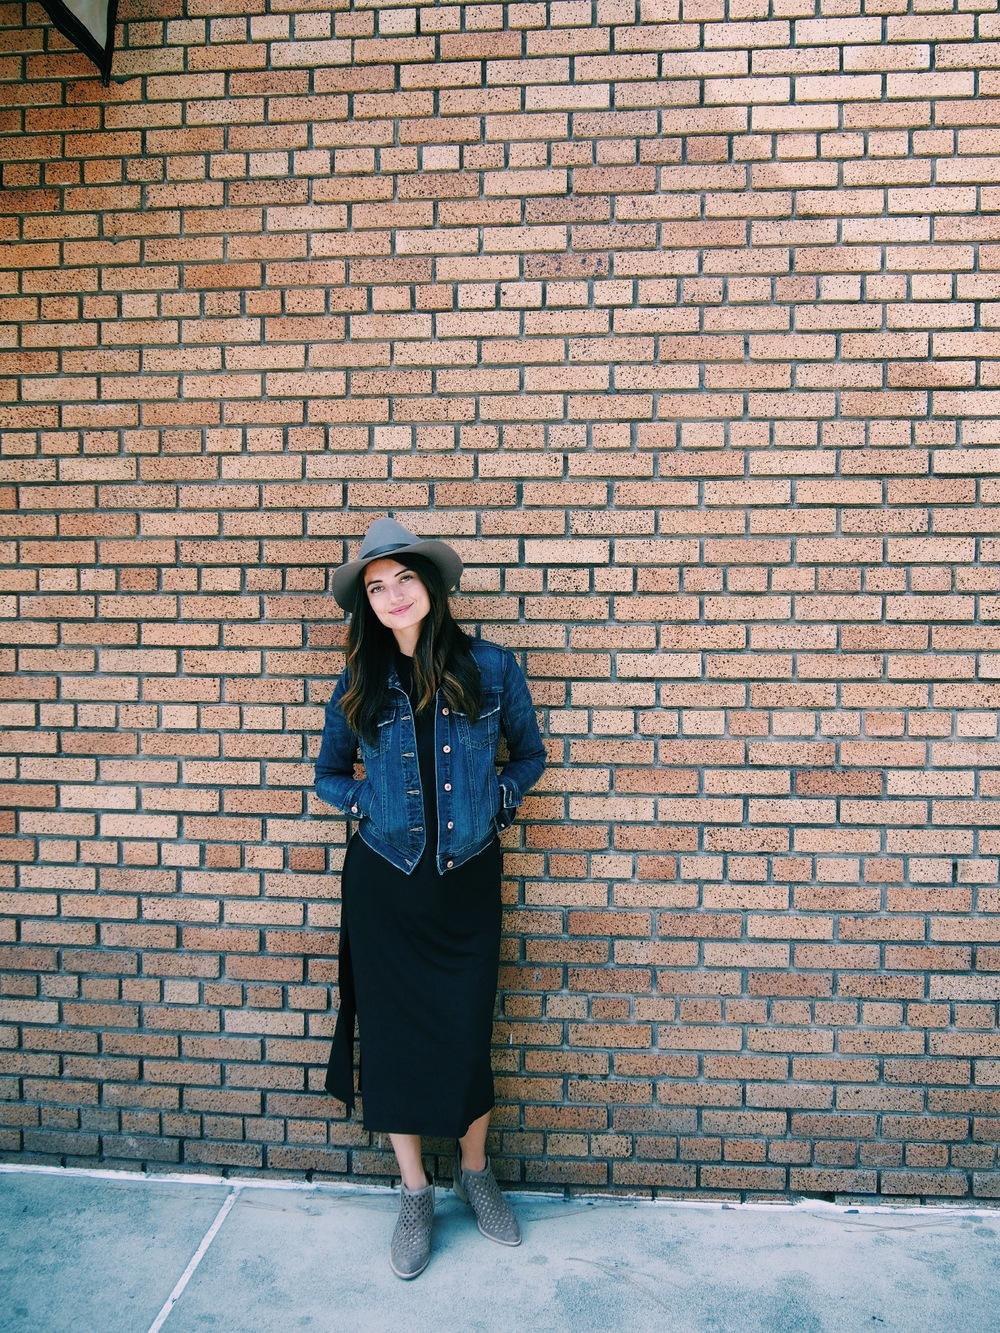 Hat: Urban Outfitters. Dress: Zara, old. Denim Jacket: Zara. Shoes: Jeffrey Campbell.